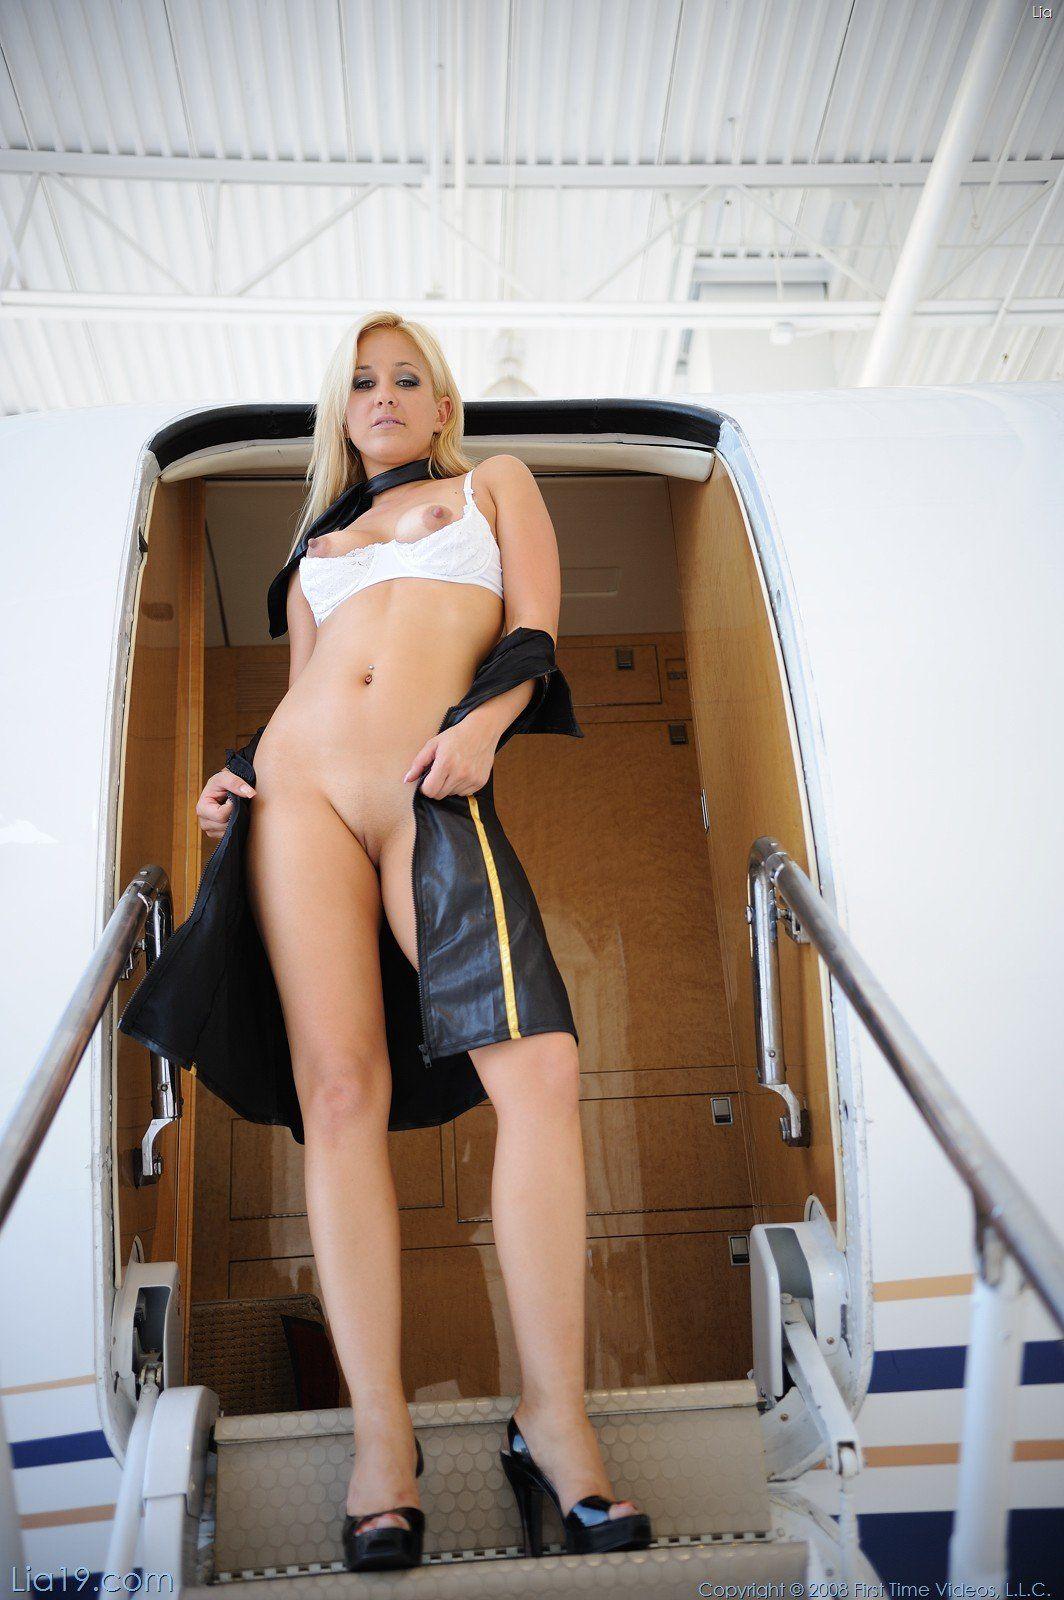 A Very Special Hostess Porn sexy air hostess porn - hot nude photos. comments: 1